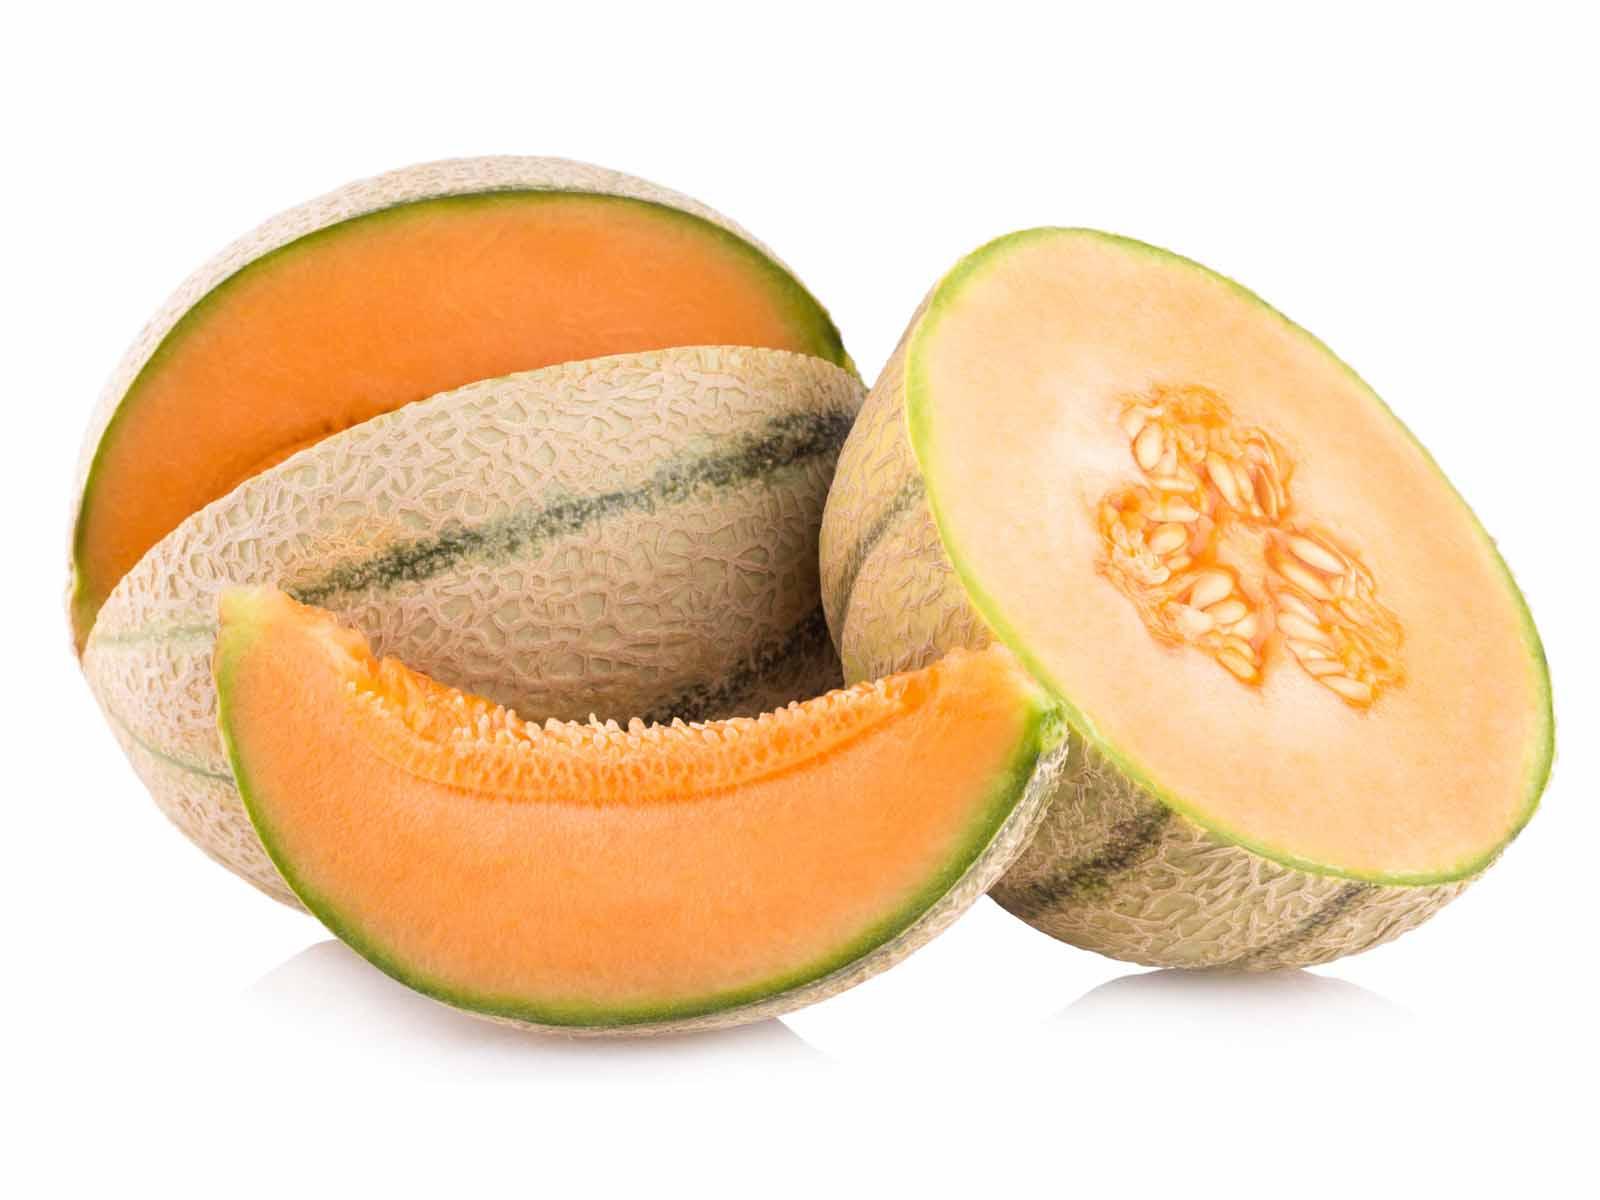 Muskmelon fruit photos